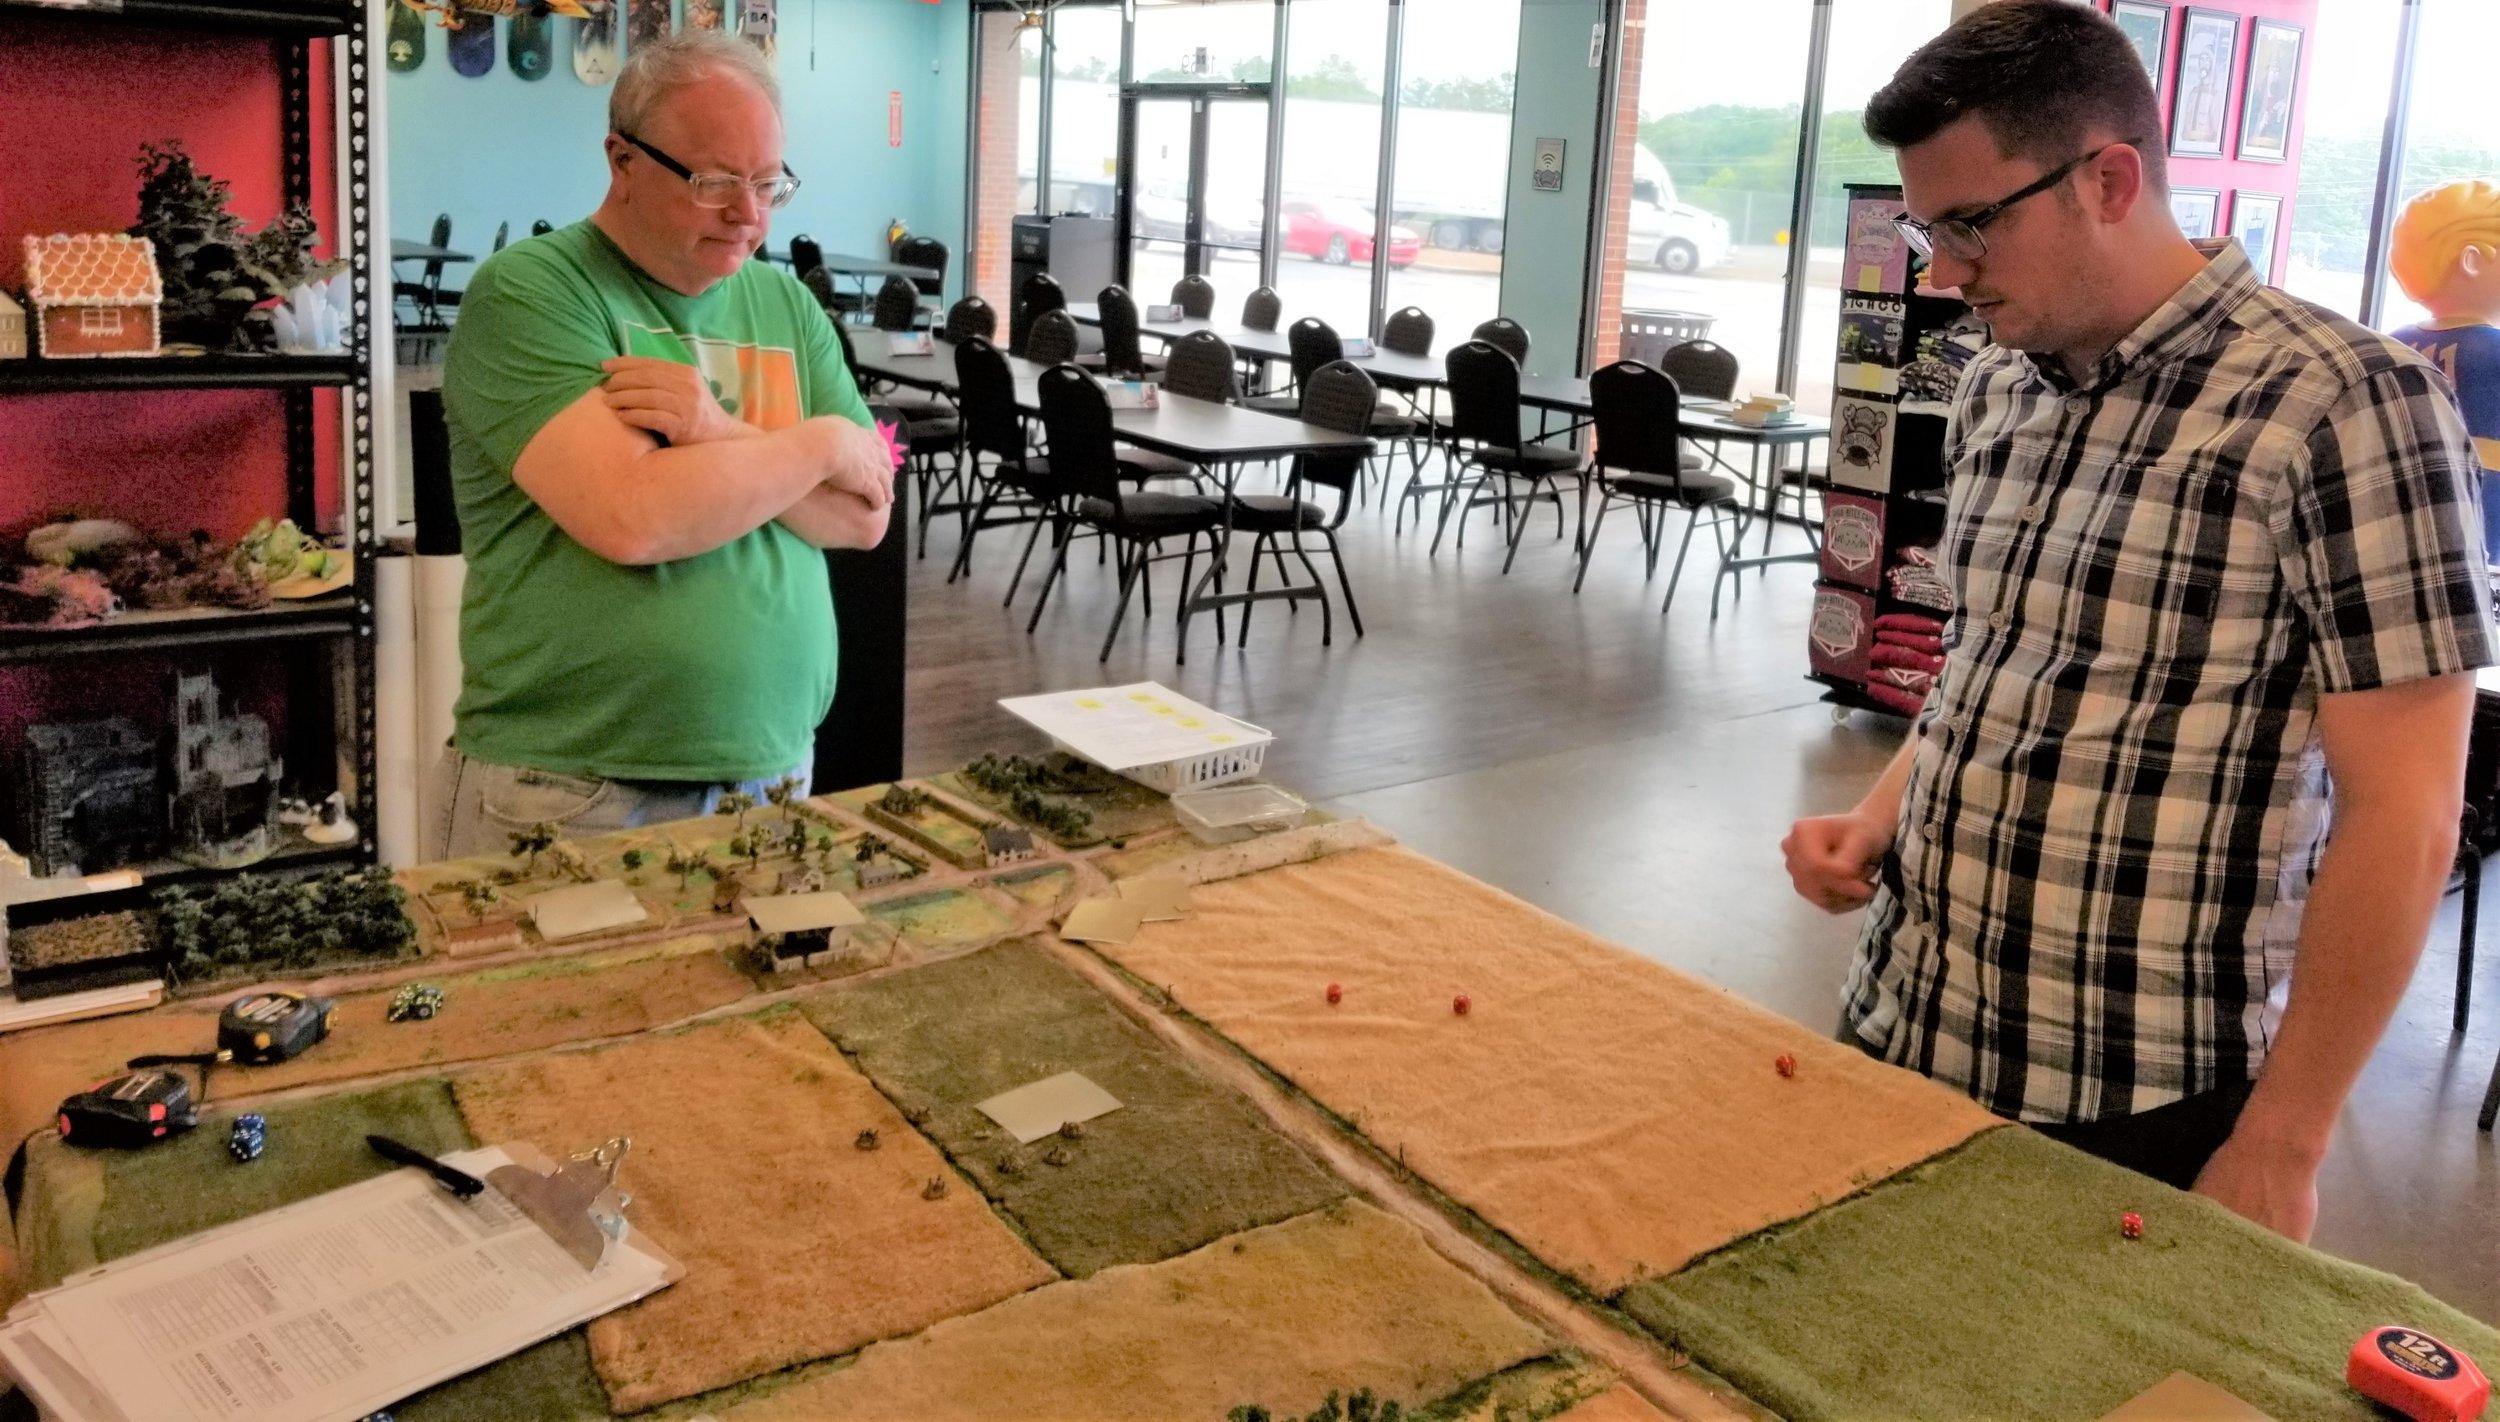 John and Matt discussing the flat terrain